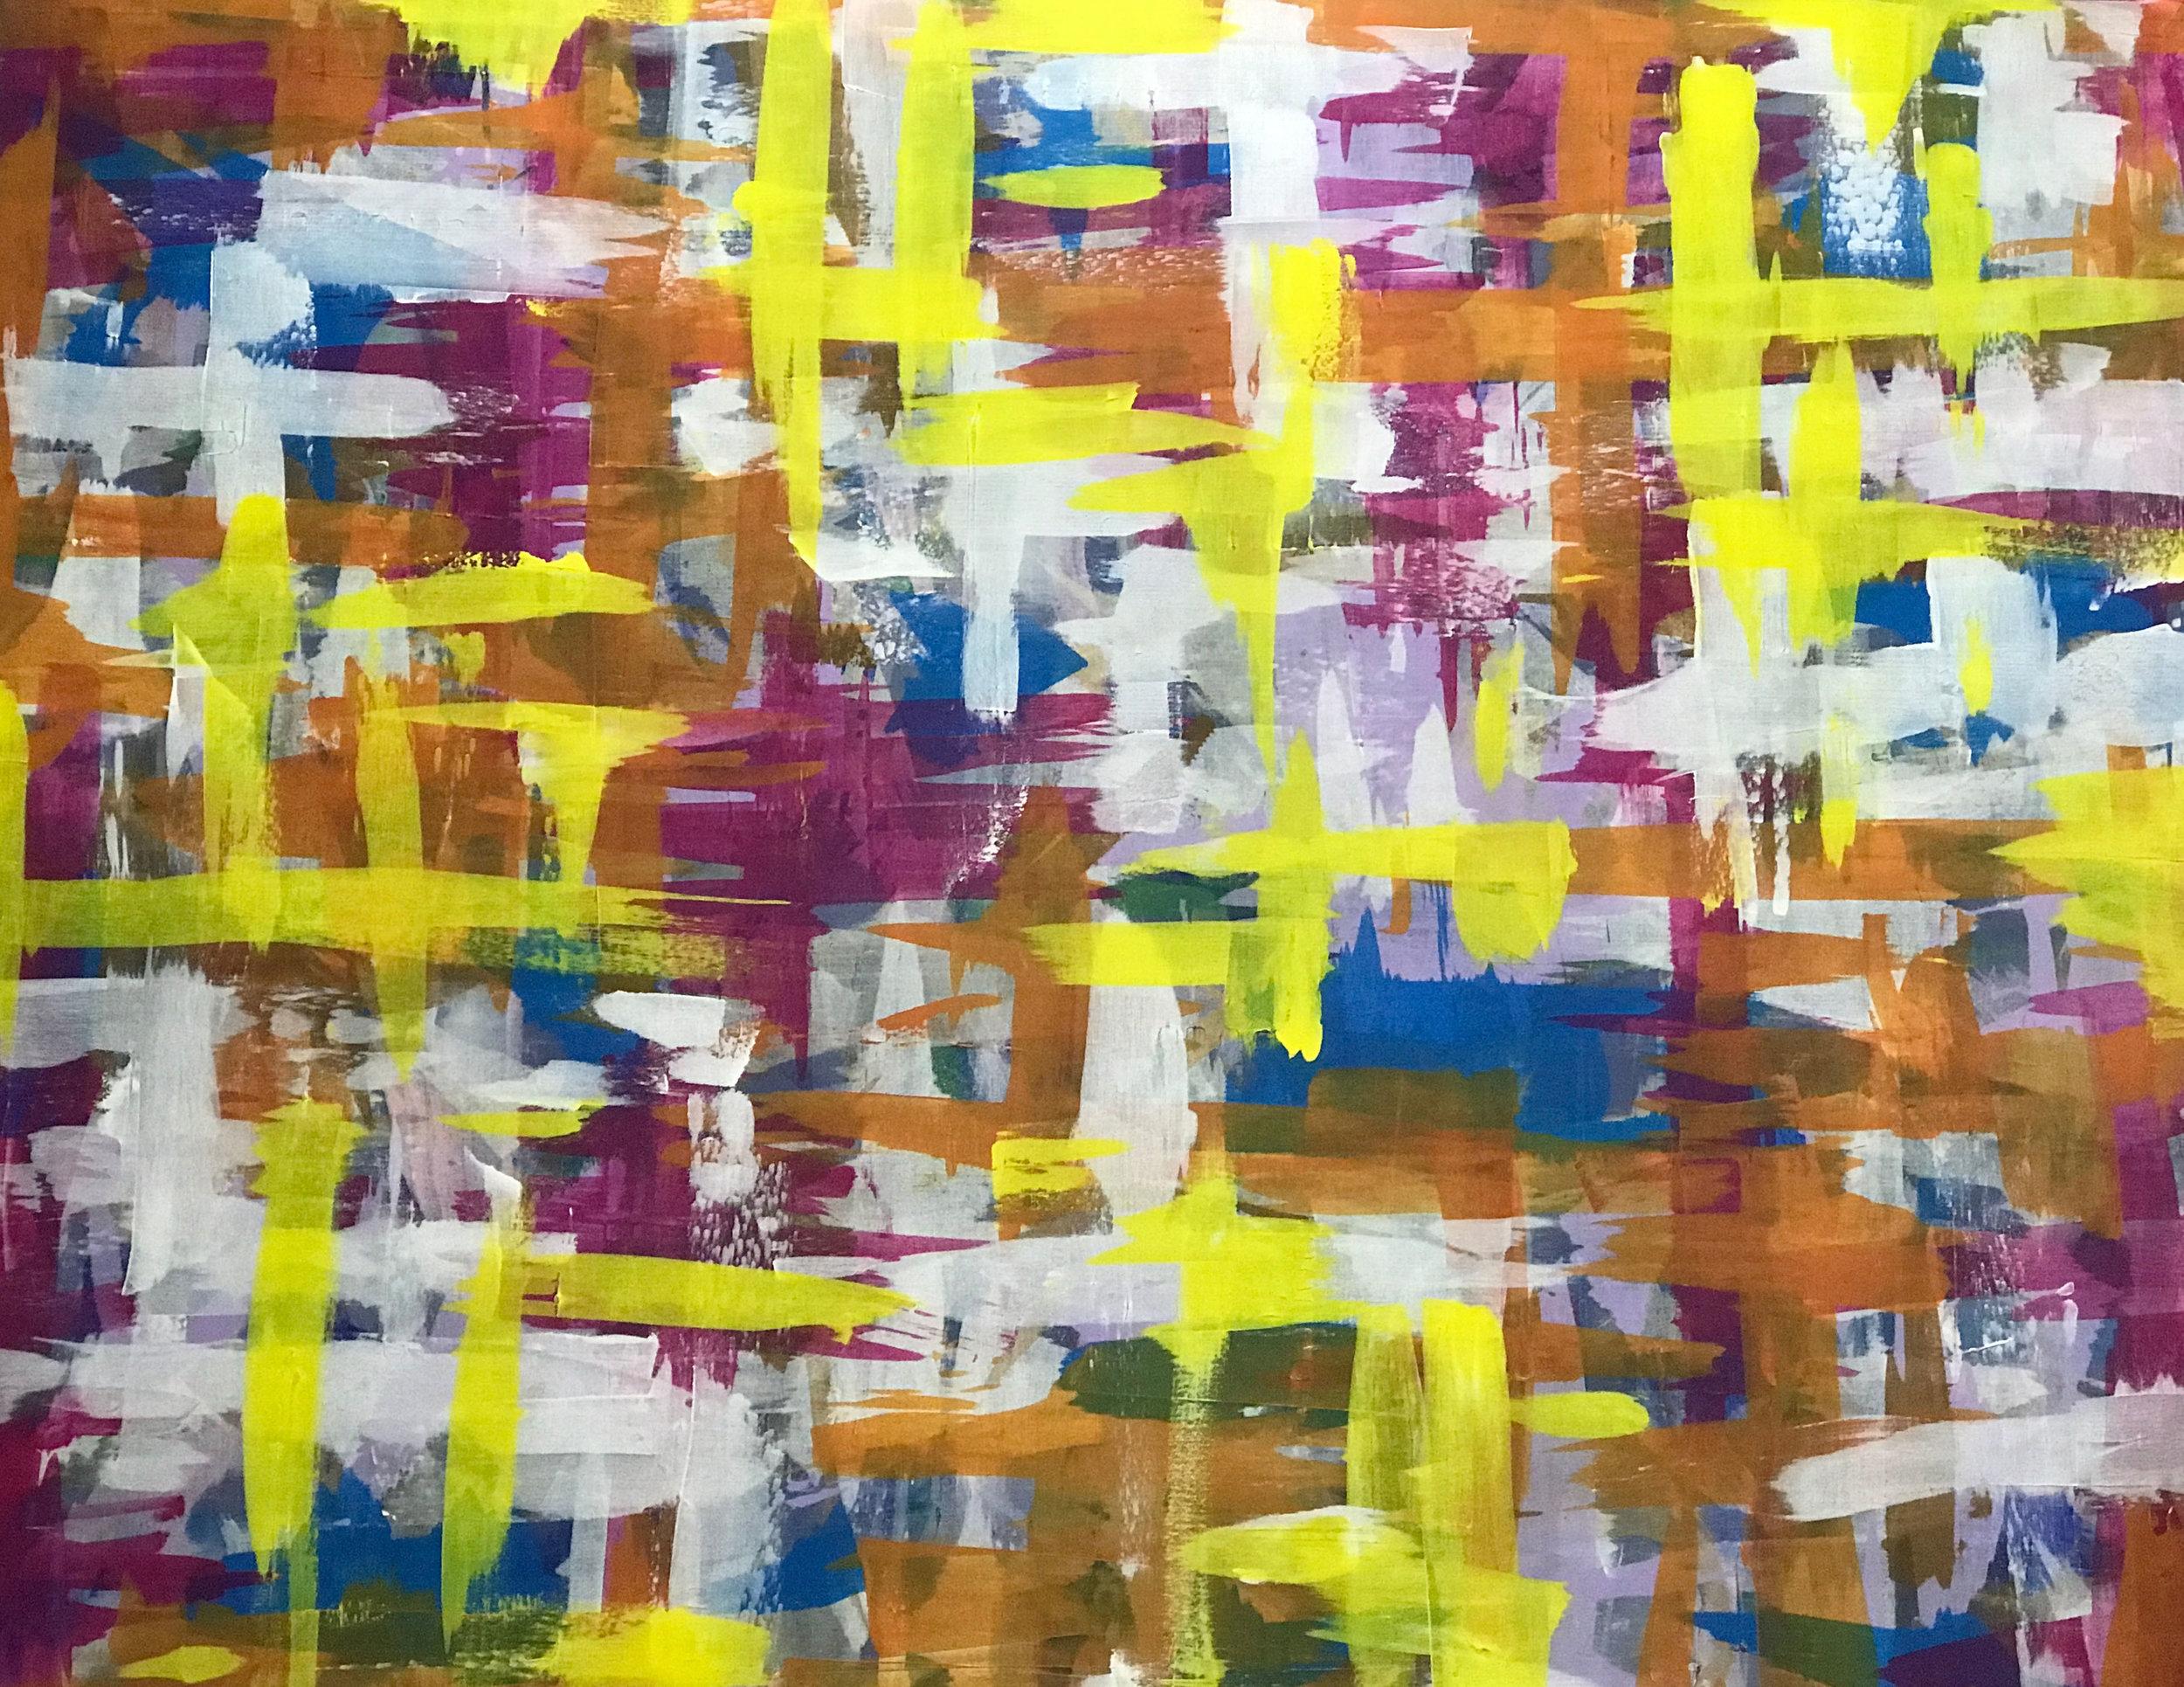 Color+My+World_Acrylic_48x60_2017_72dpi.jpg